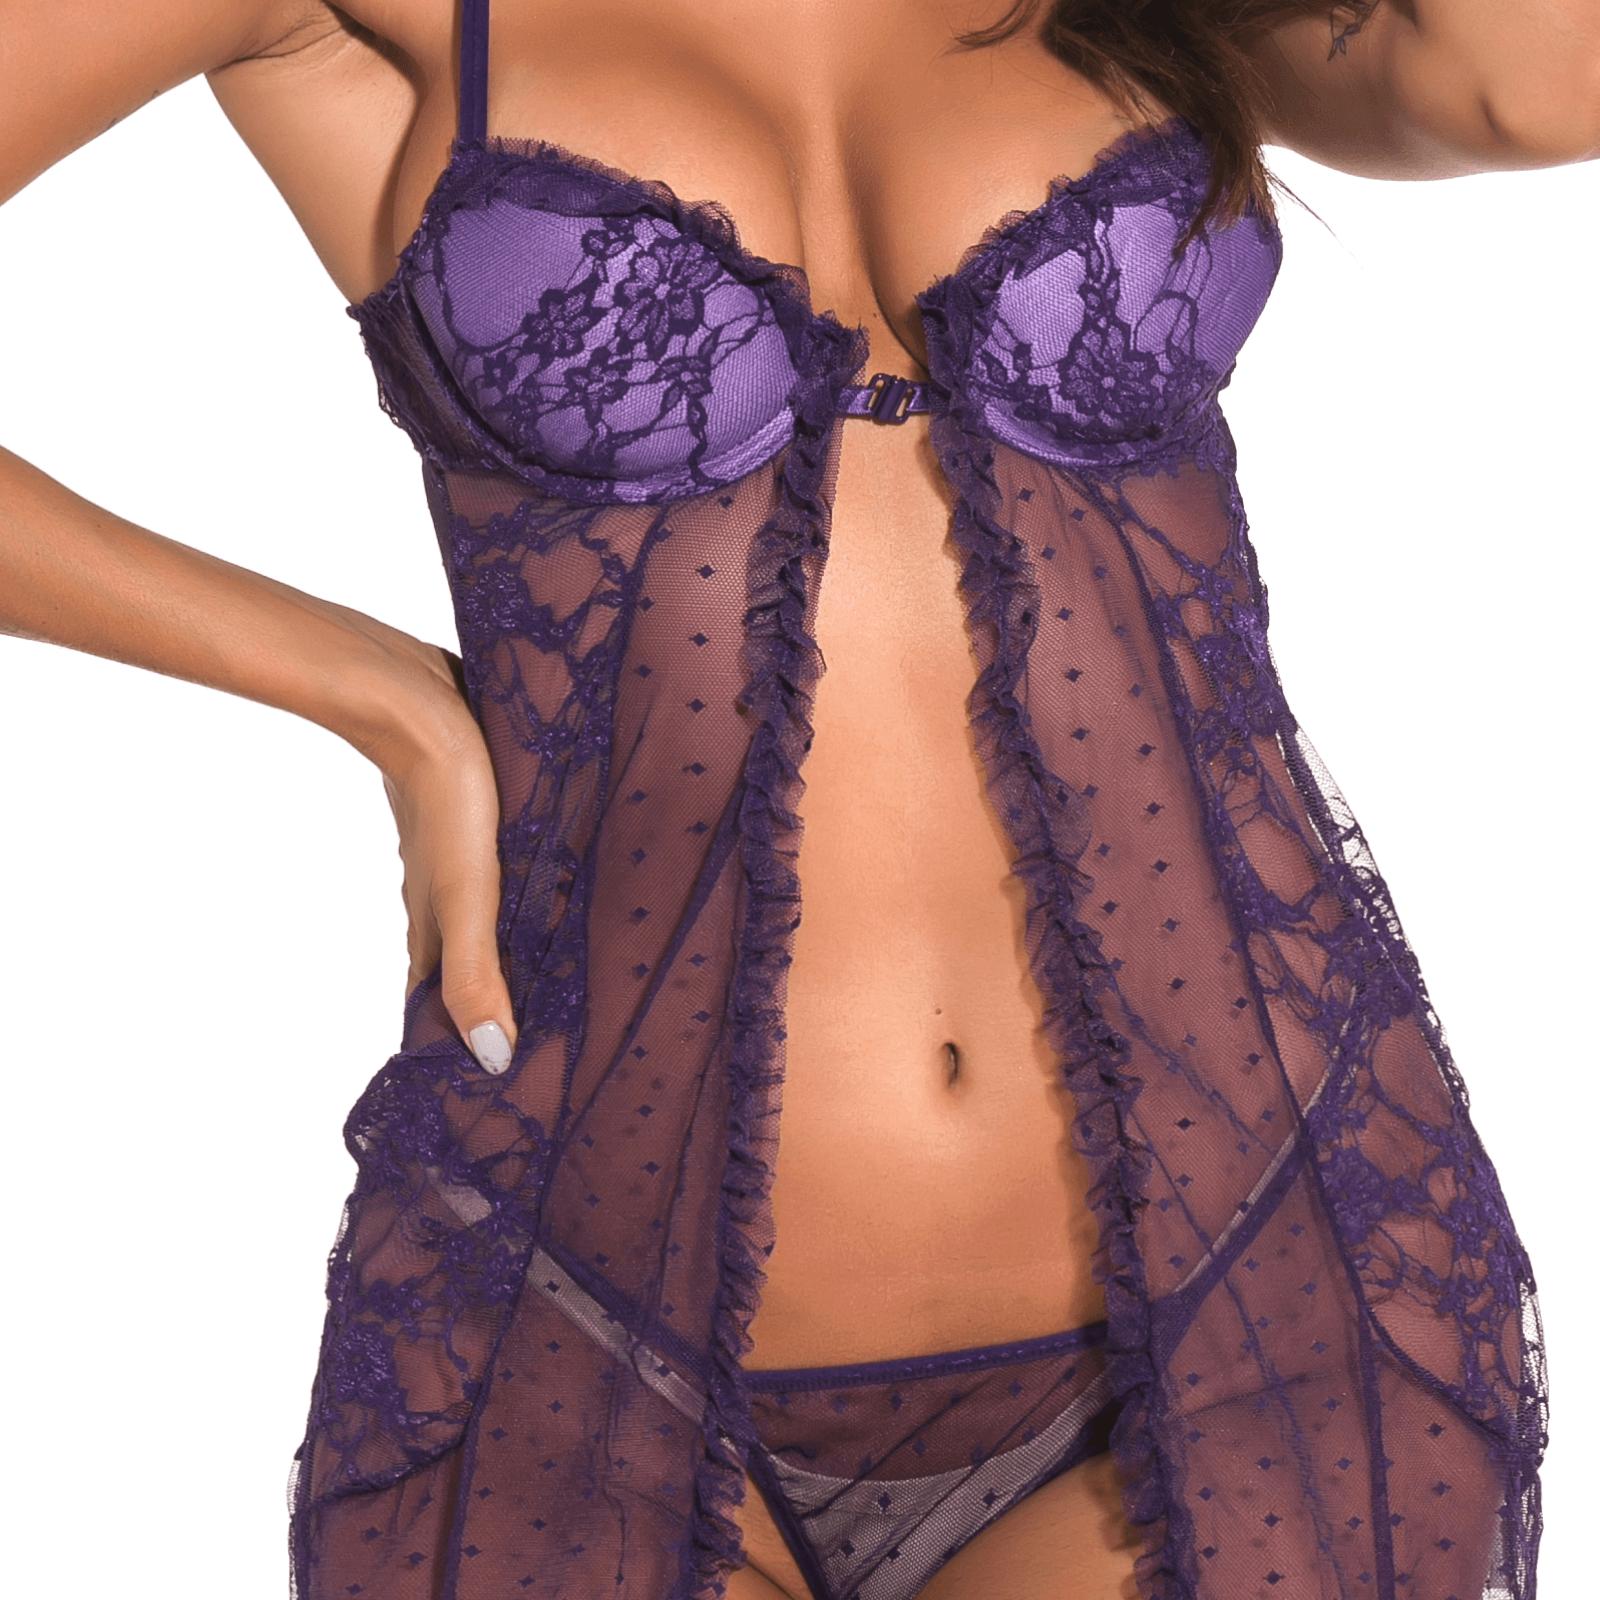 Lendgogo Sexy Purple Lace Lingerie